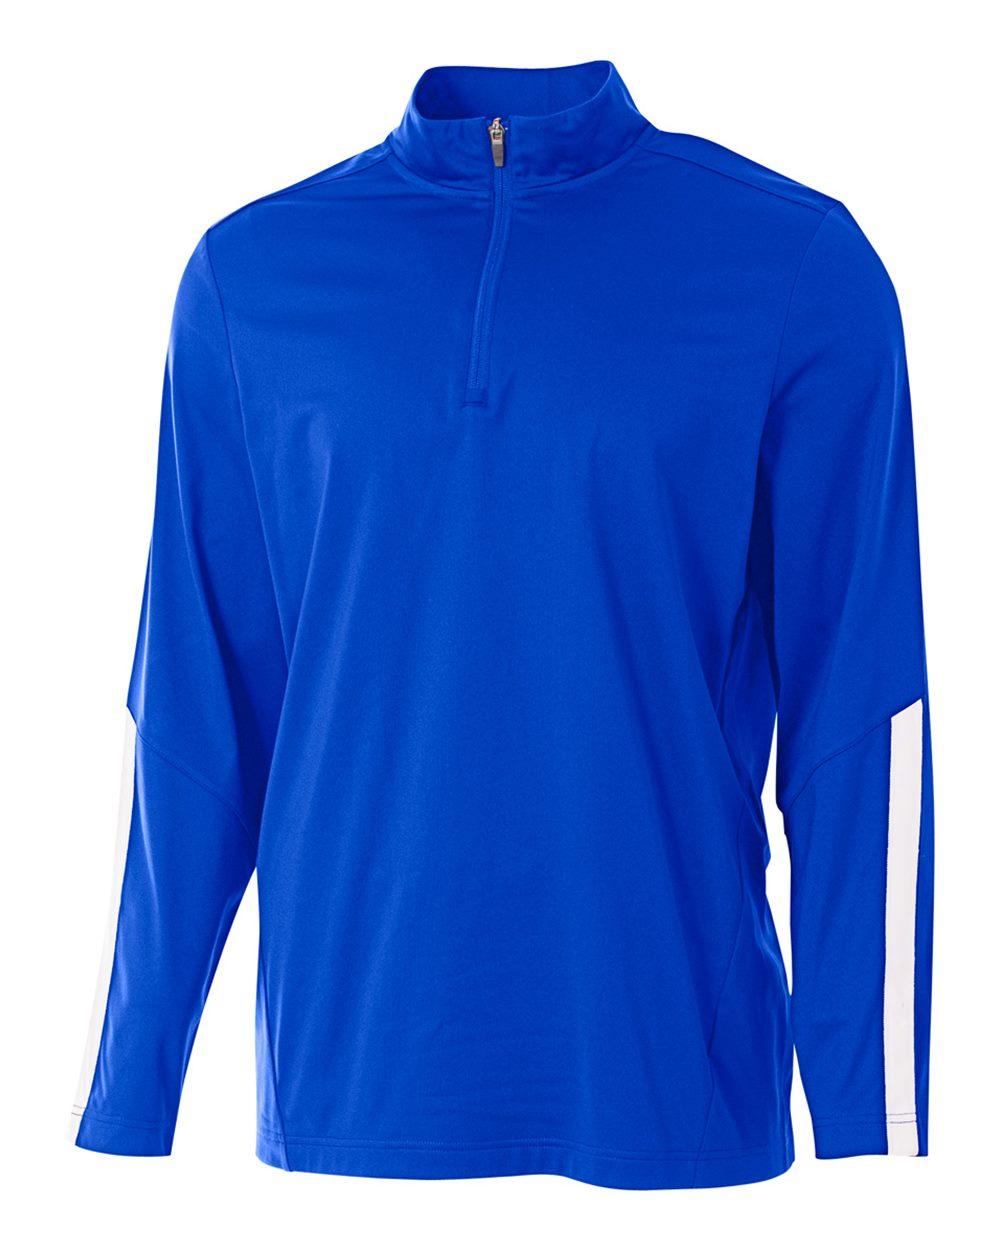 A4 League 1/4 Zip Jacket